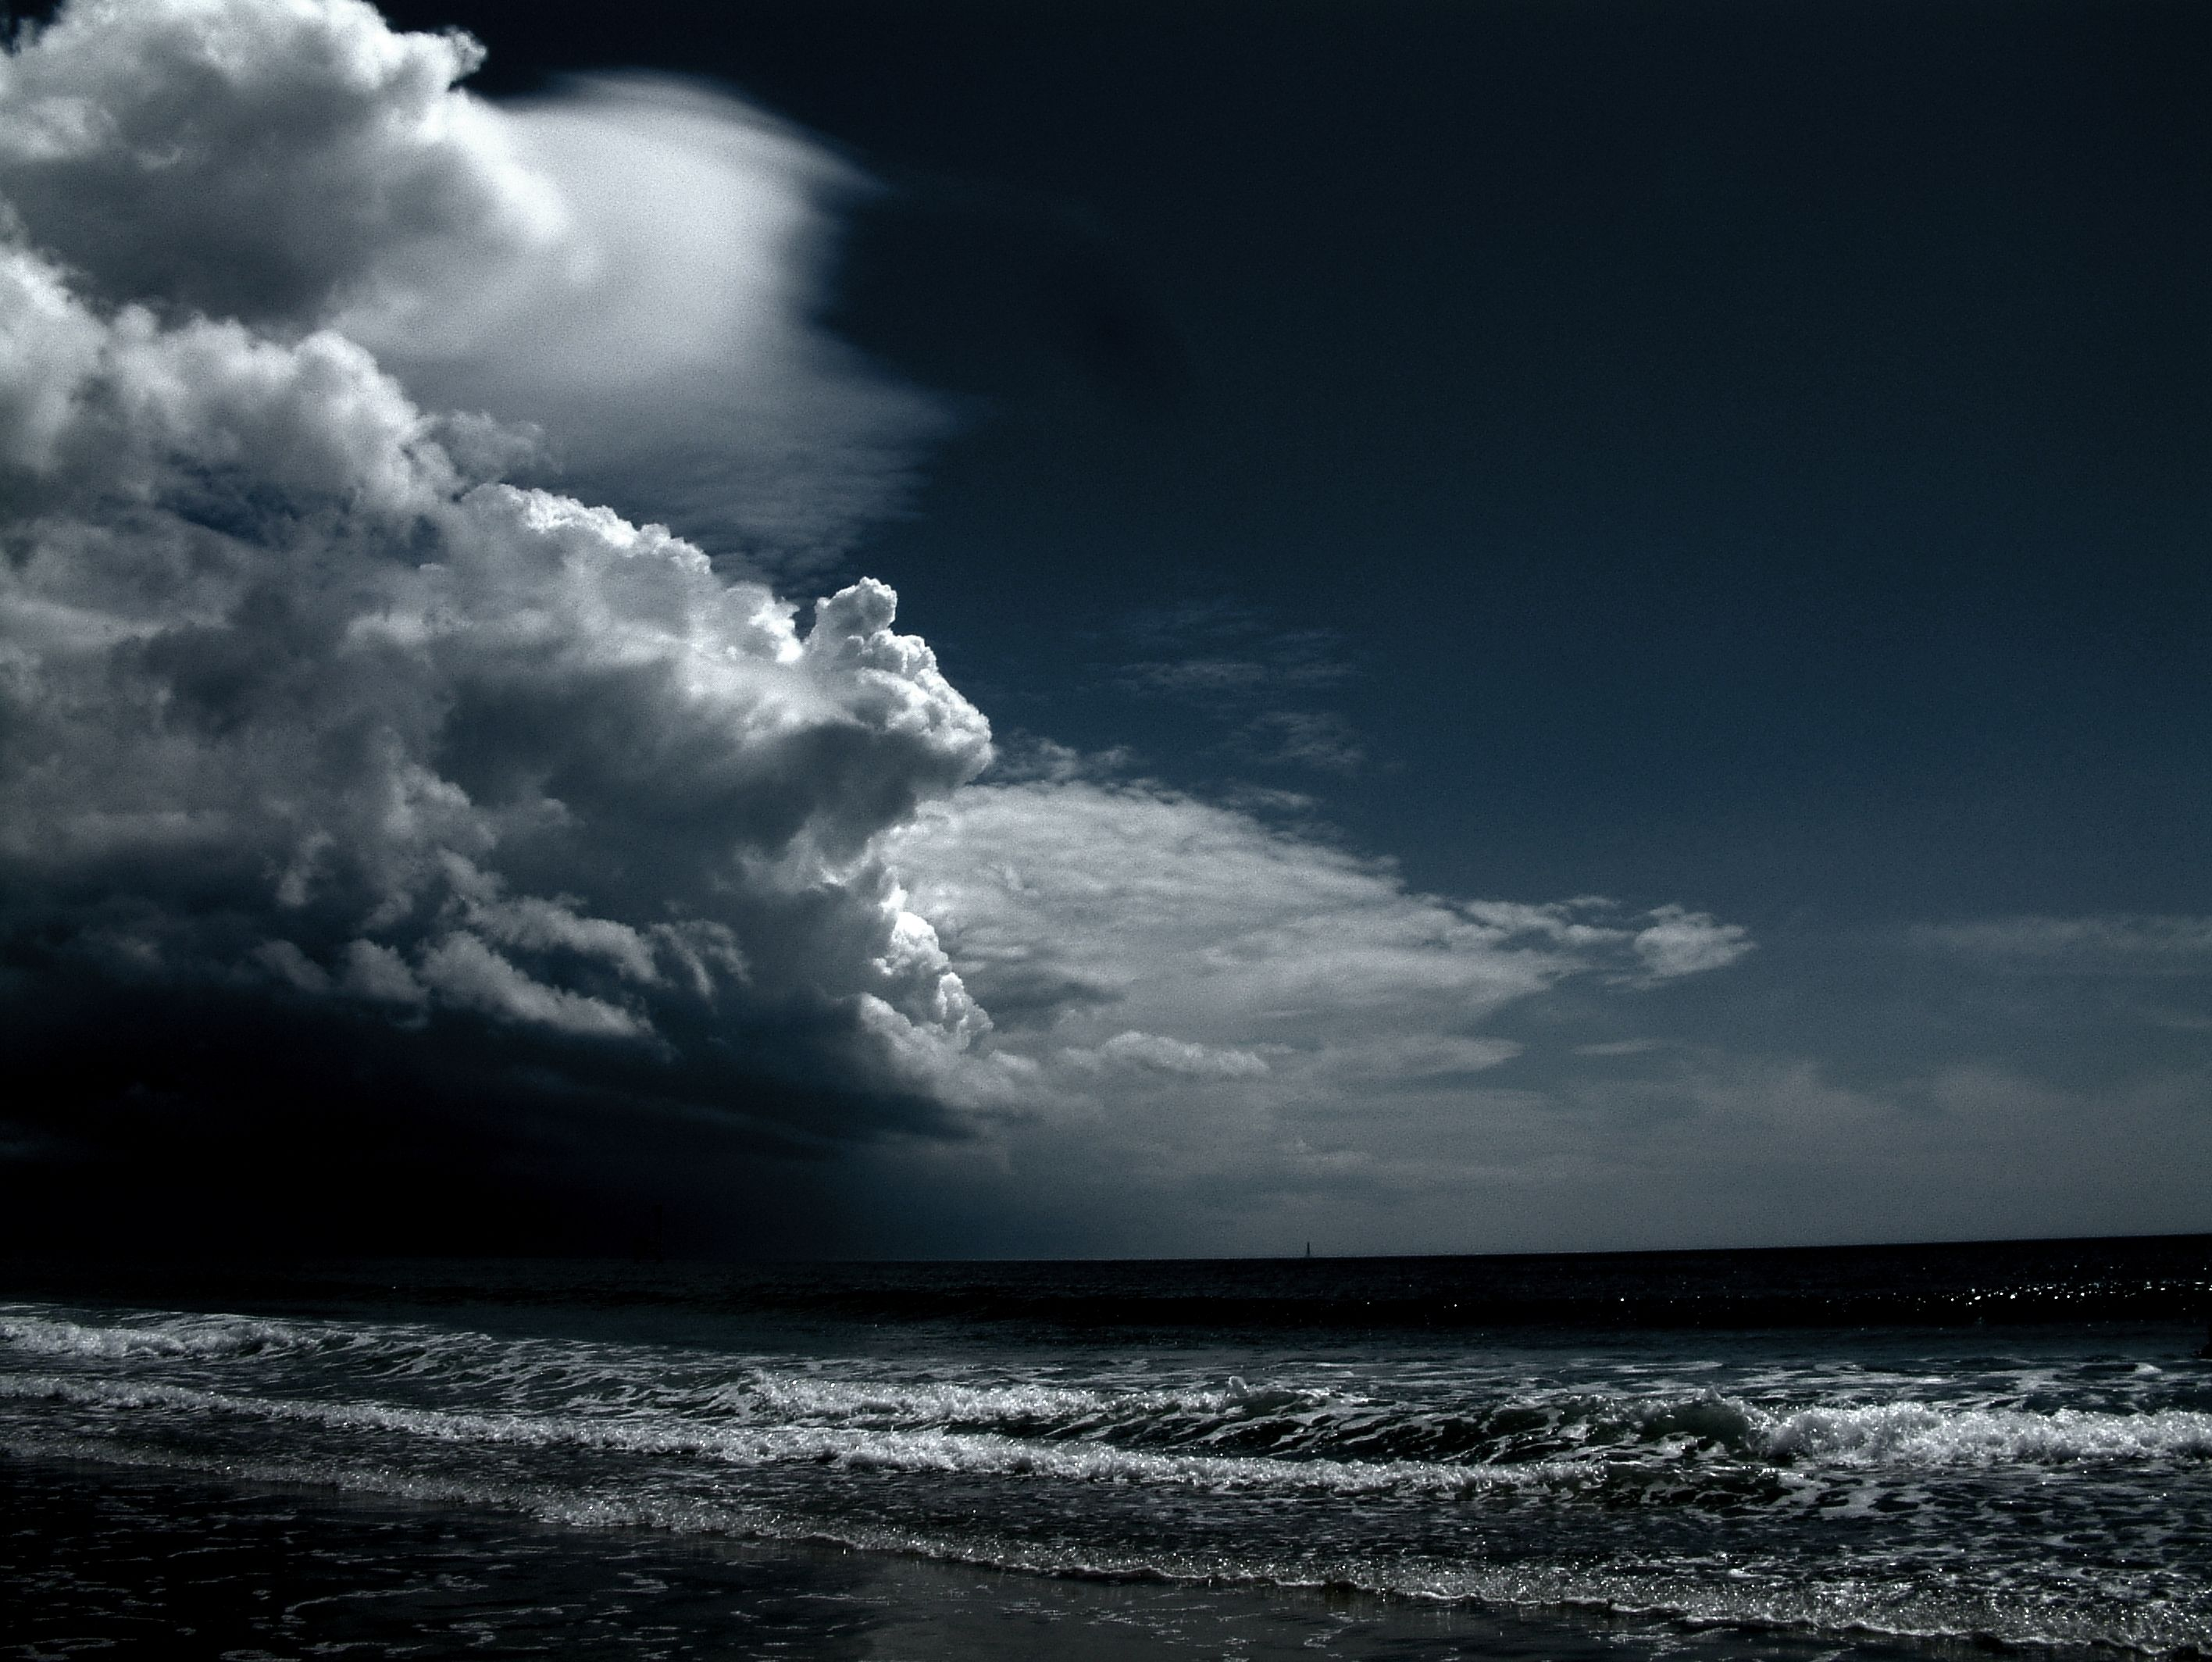 Dark Landscape Inspiration Ocean Wallpaper Dark Landscape Storm Wallpaper